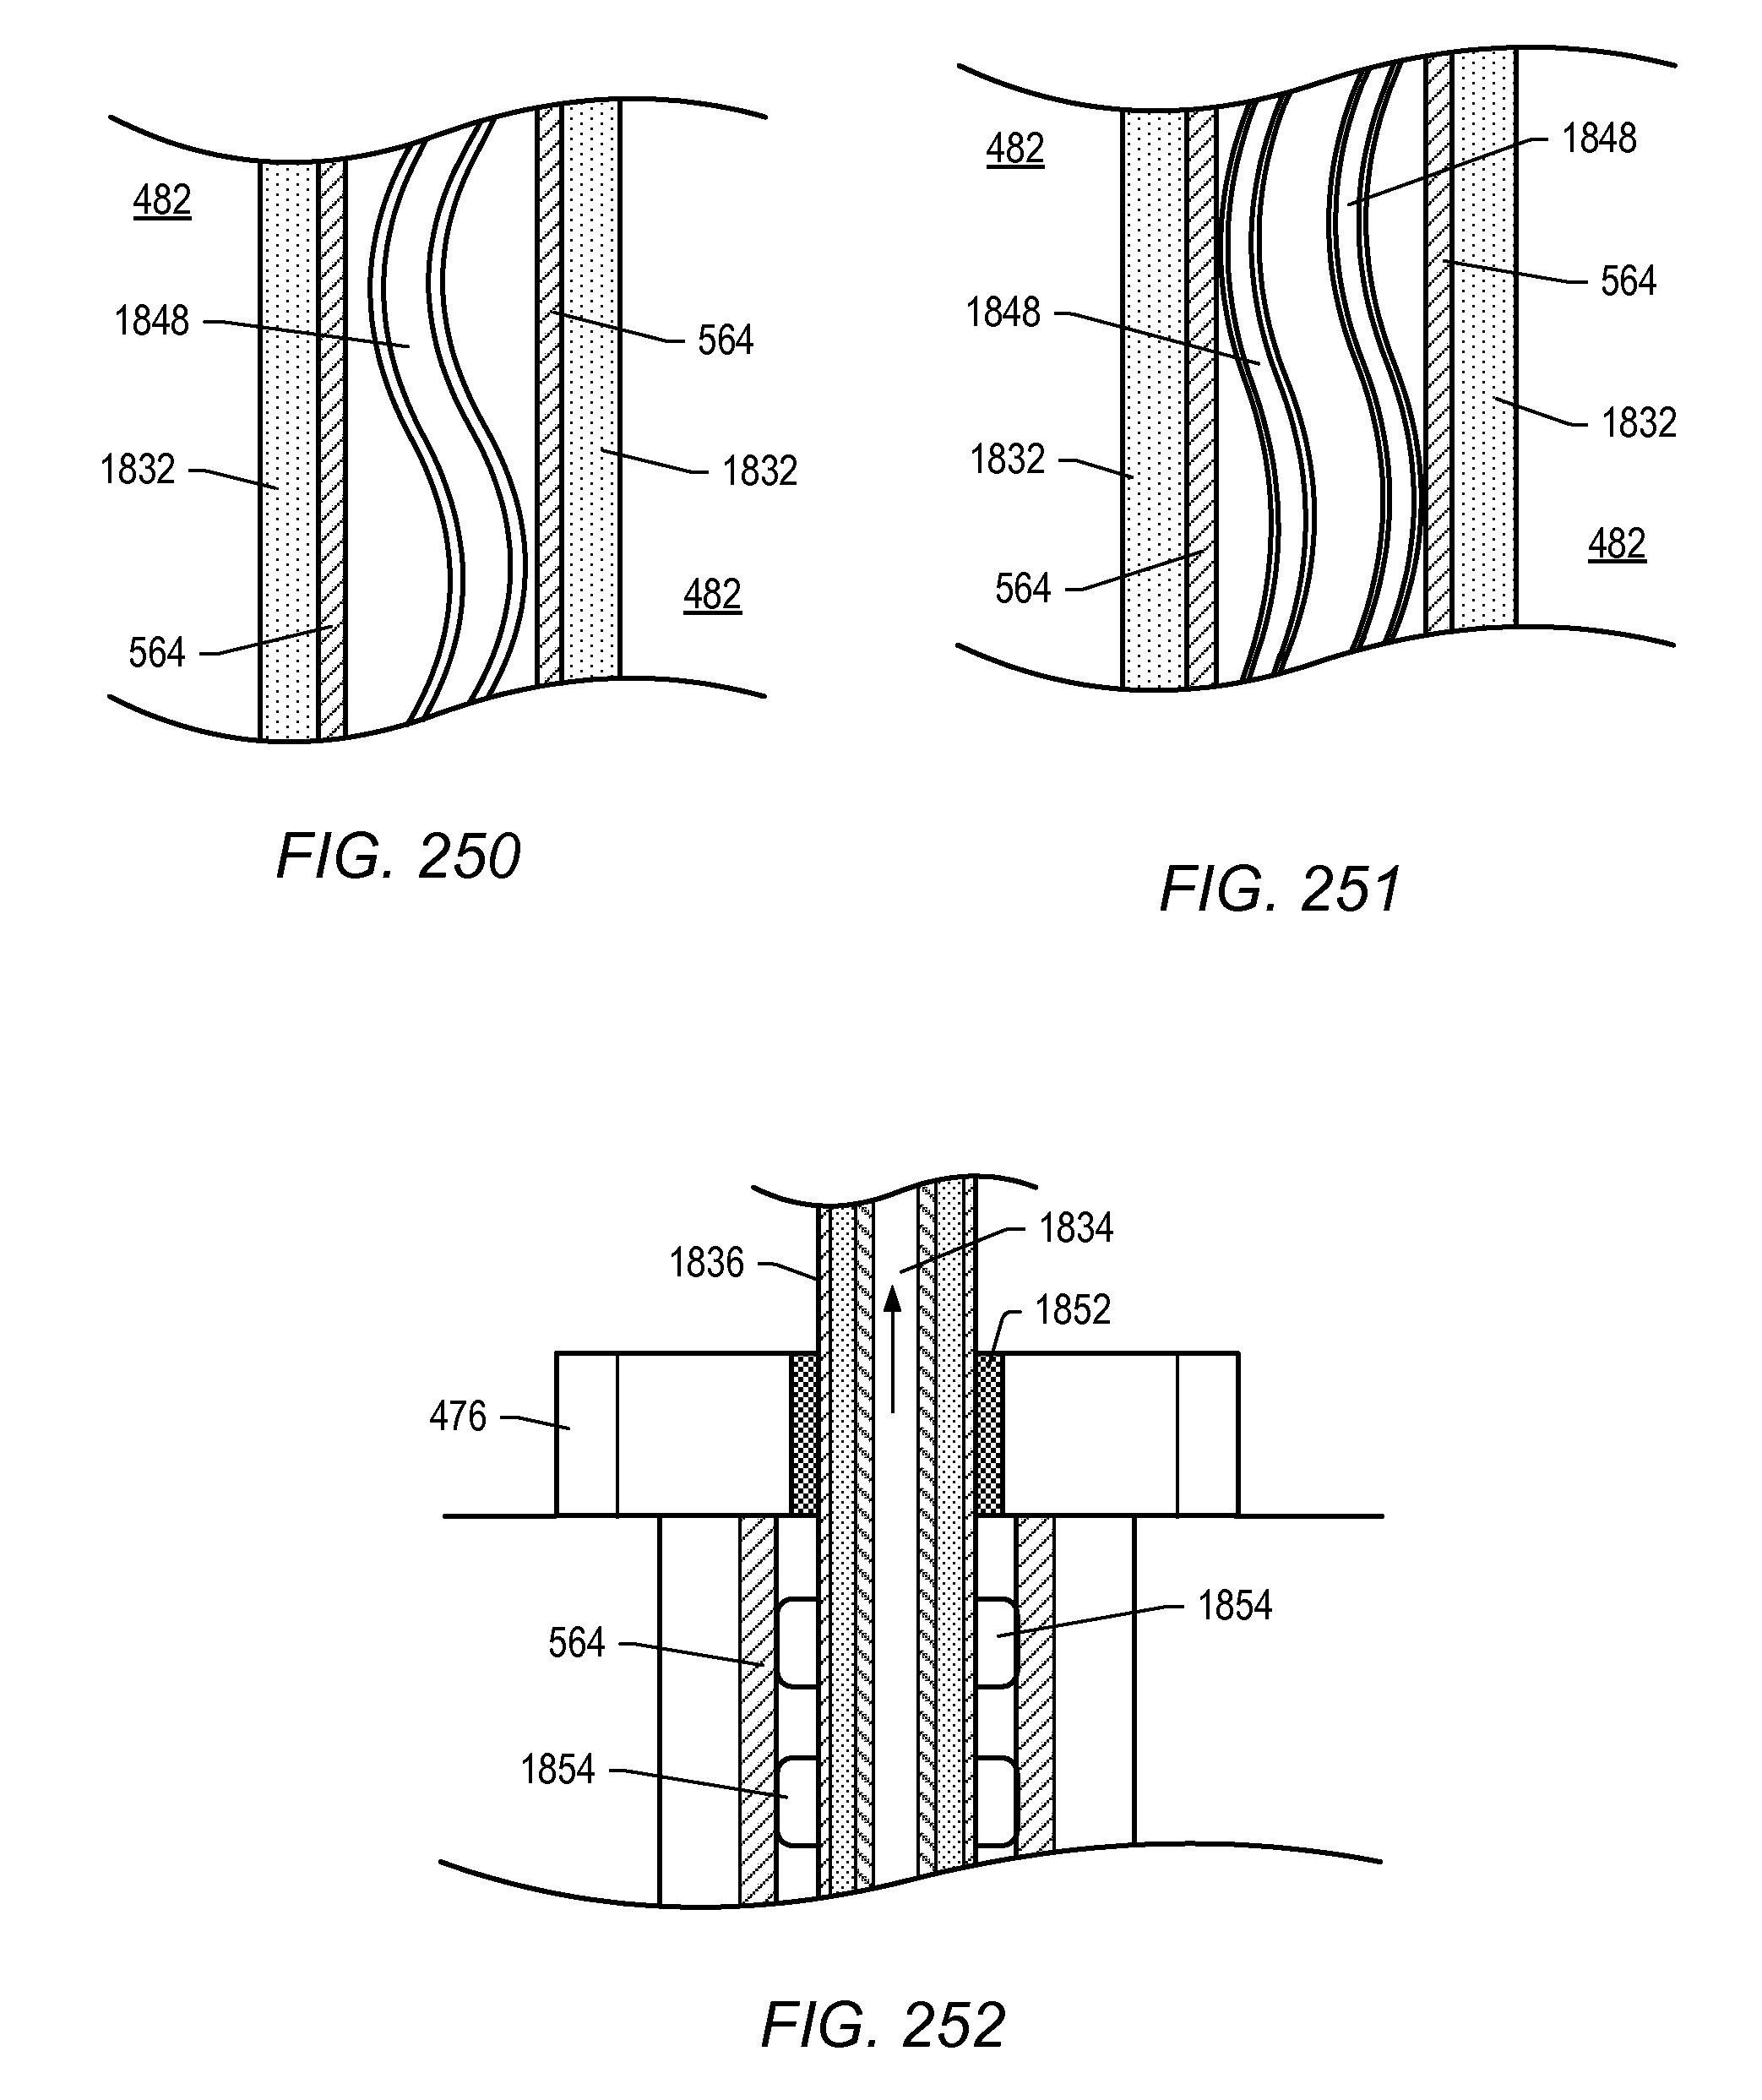 Patent US 8,011,451 B2 on